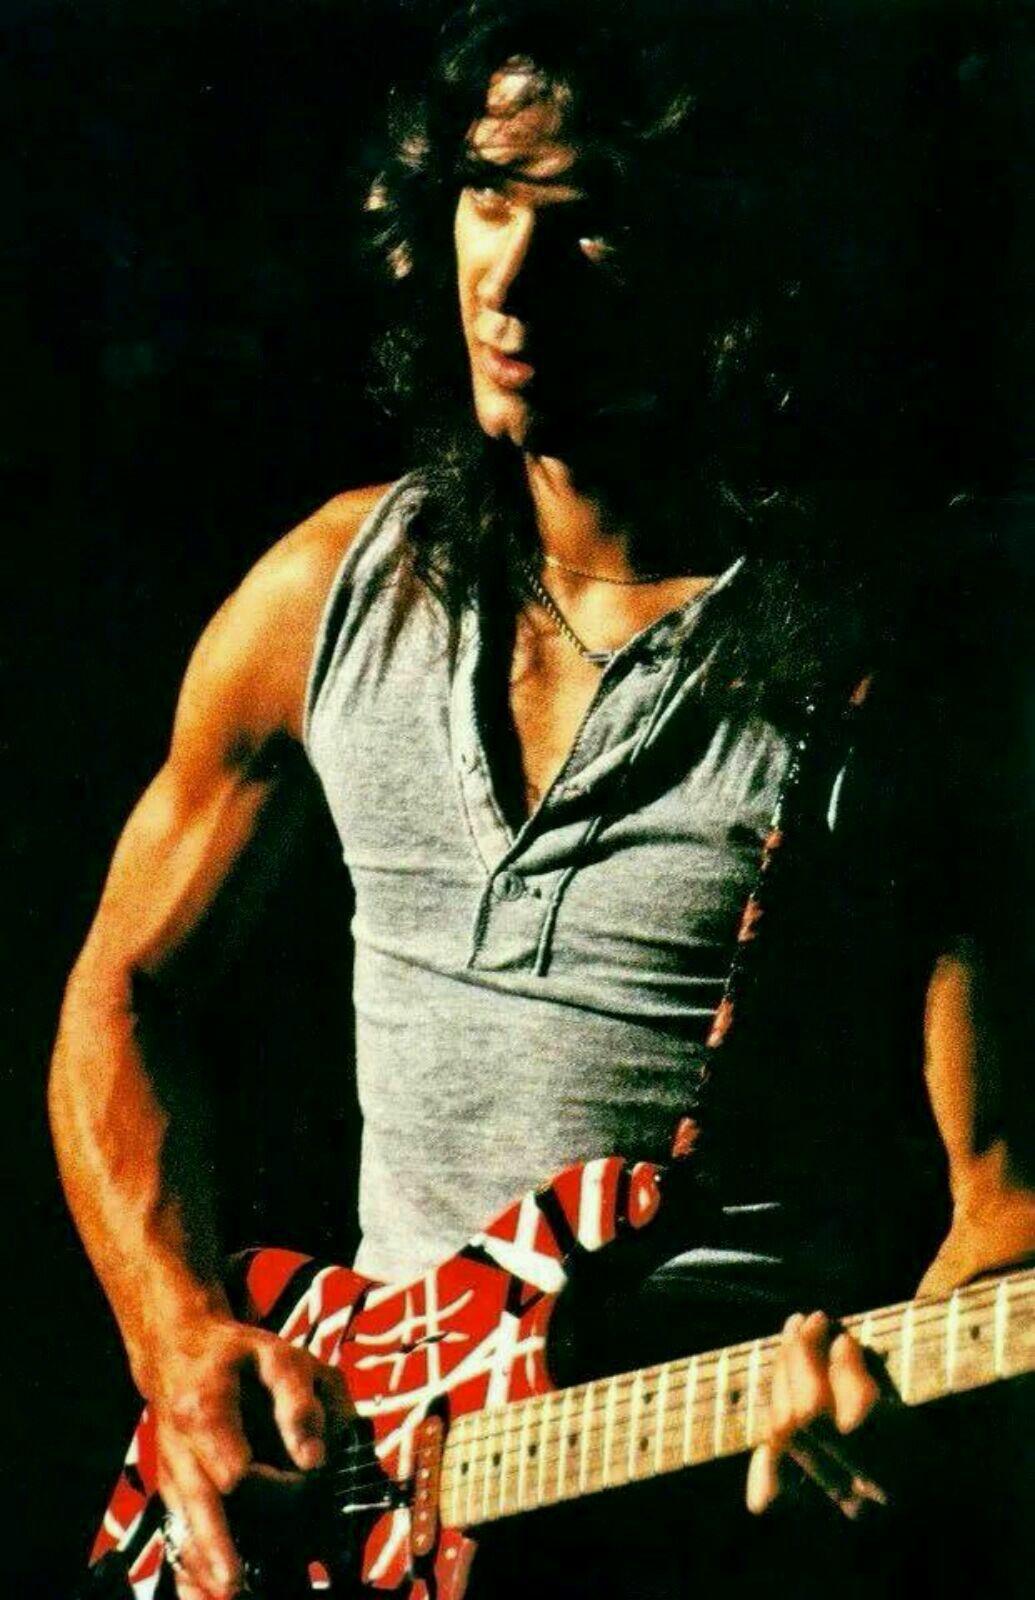 Eddie 3 Van Halen Eddie Van Halen Van Halen 5150